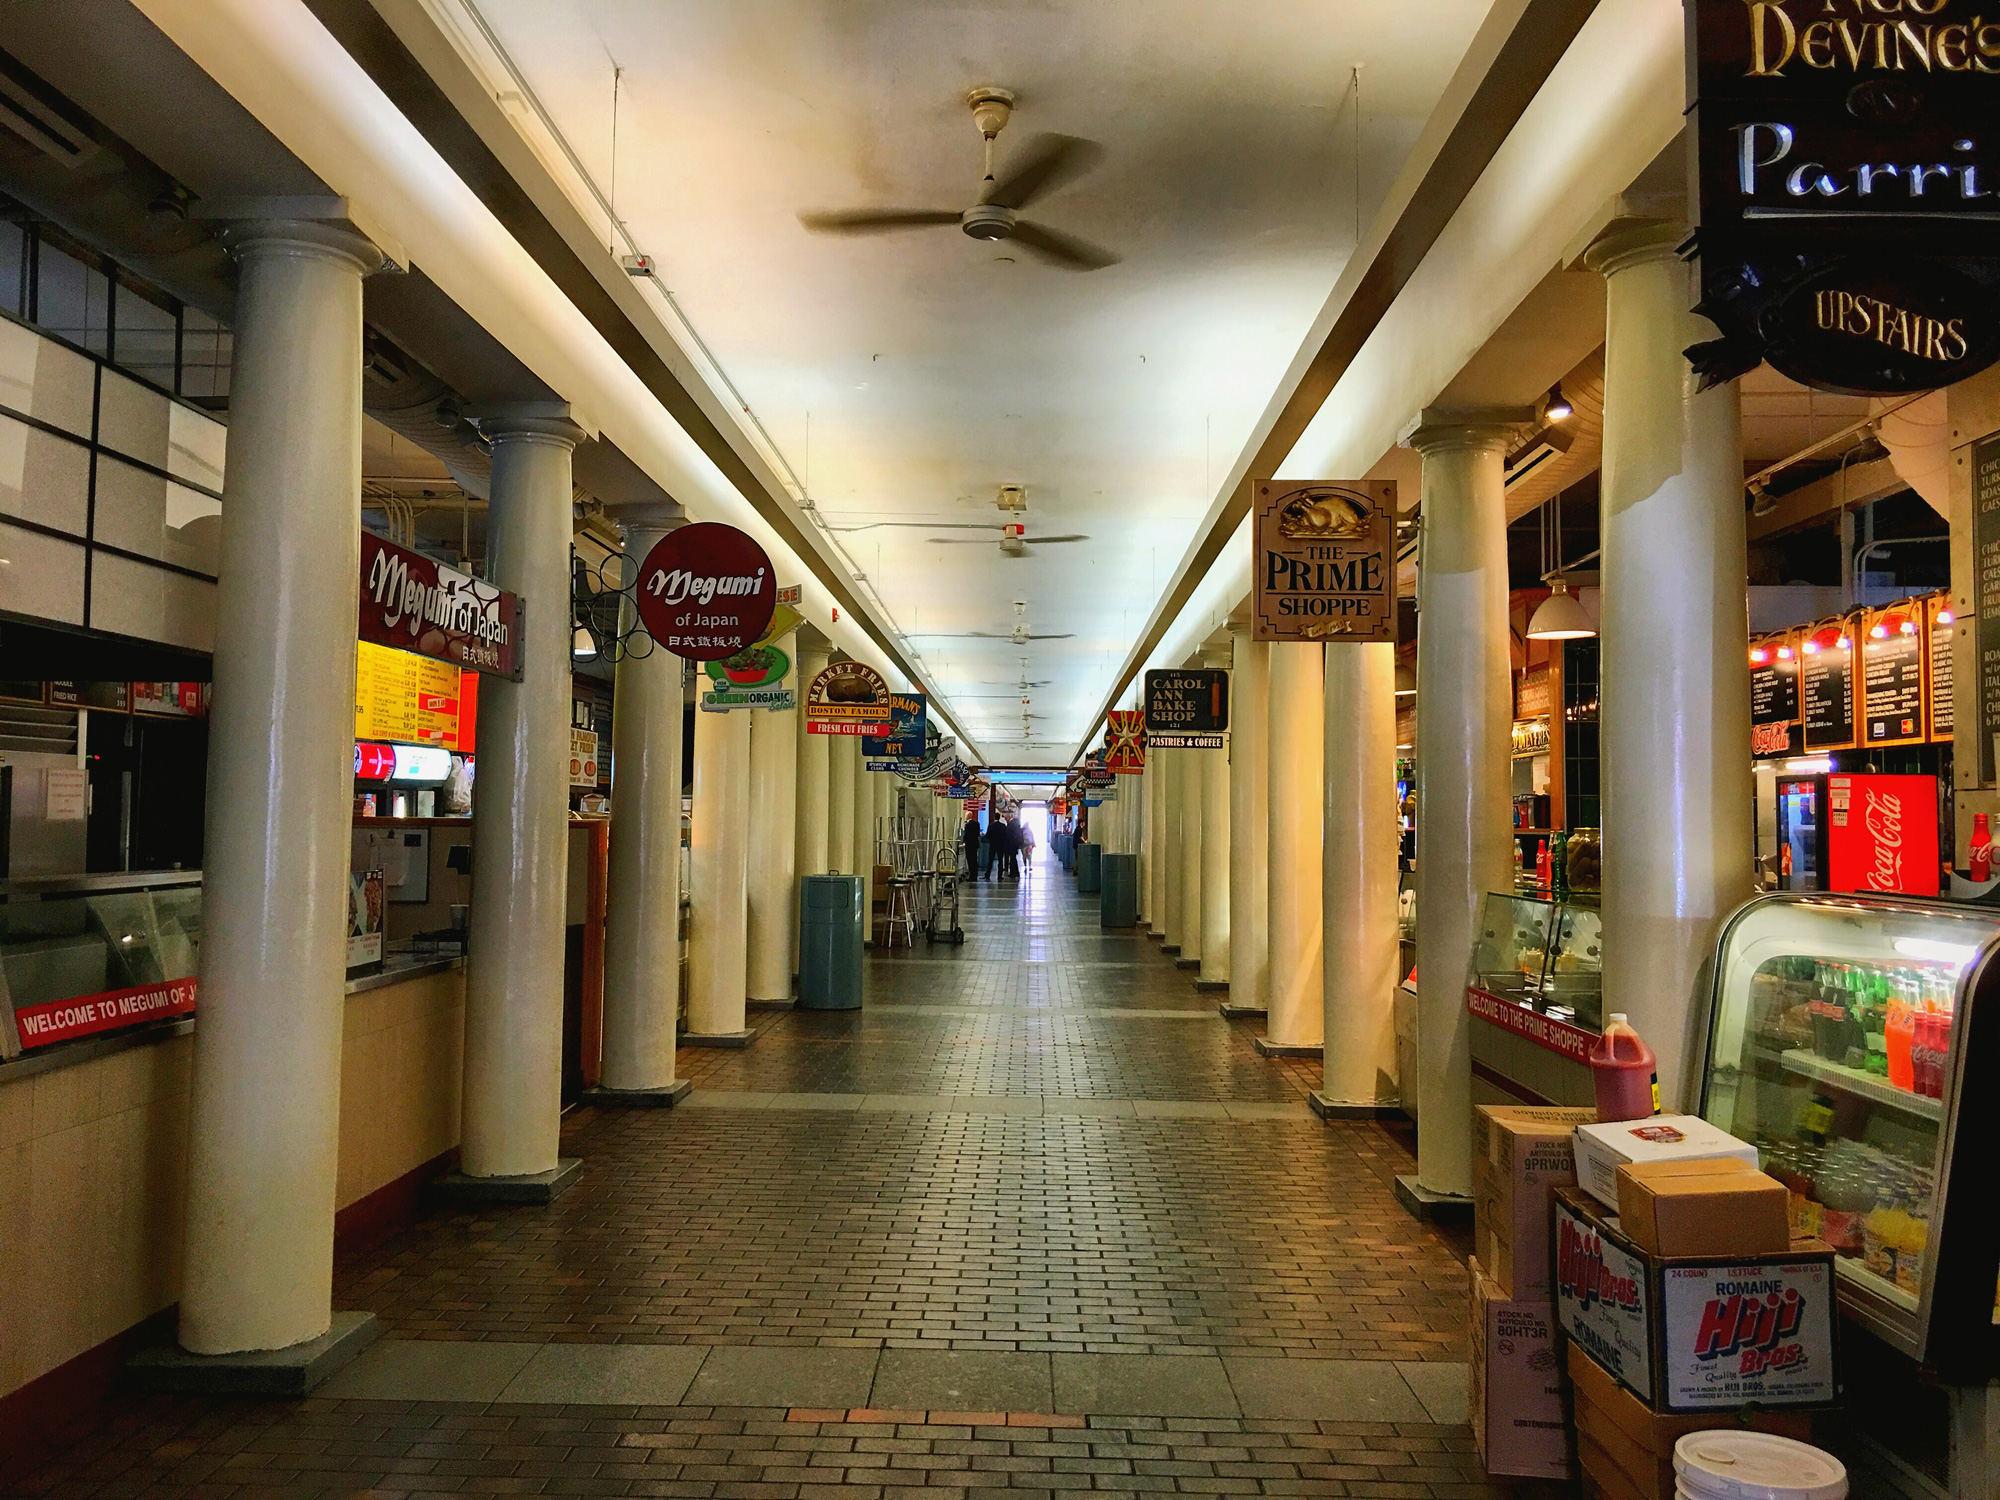 Quincy Market内部,时间尚早,大部分店铺还没有开始营业